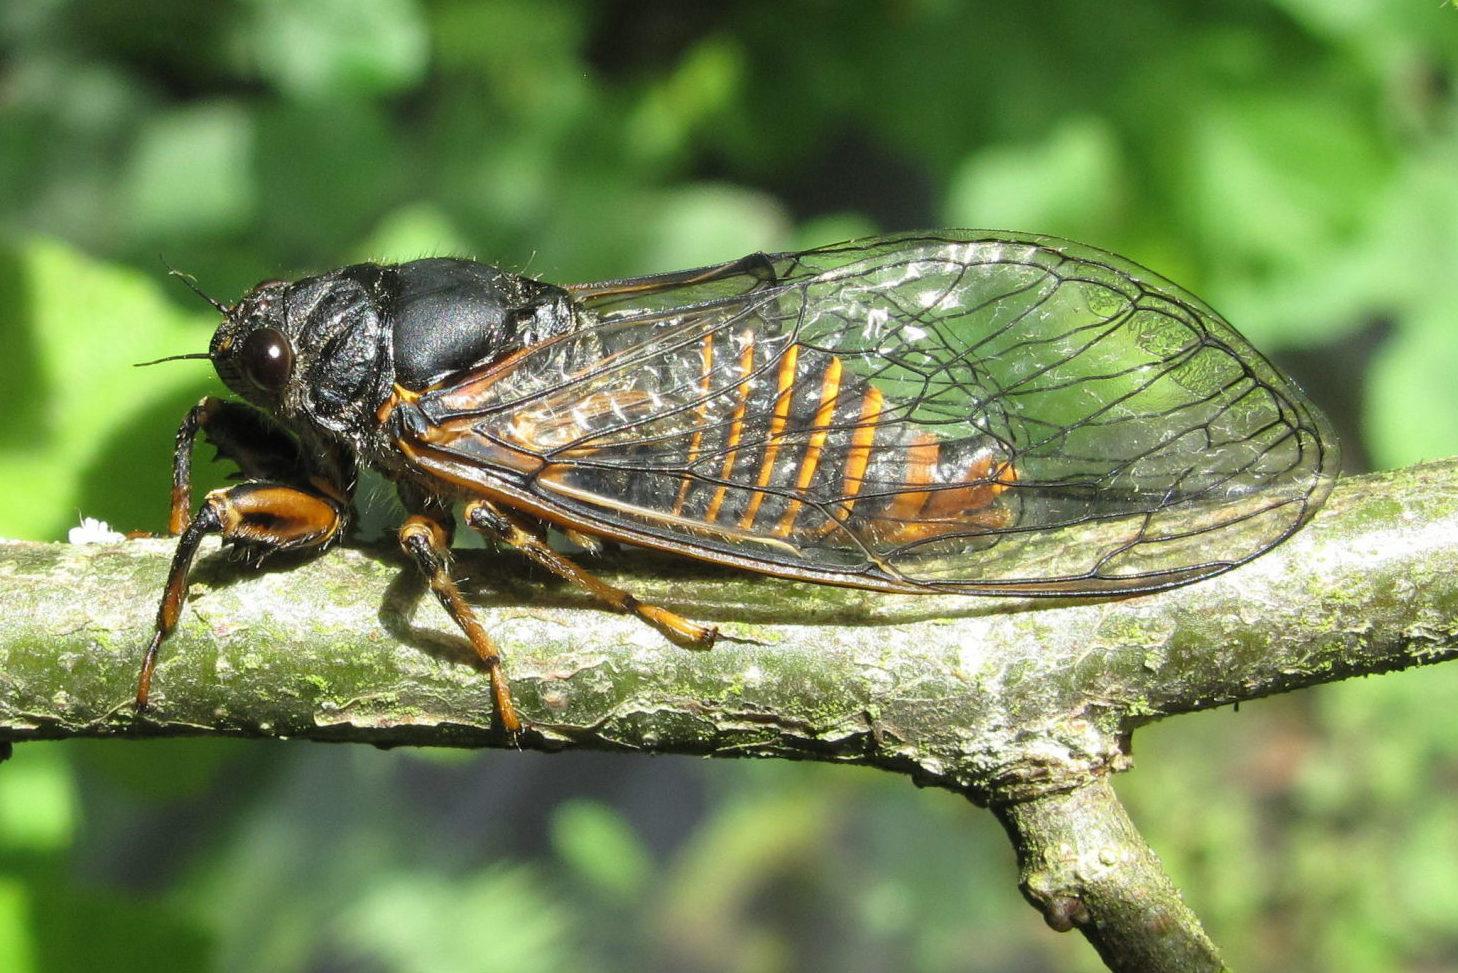 Cicadetta monatana, Lüen GR, Switzerland, CC-BY-SA-4.0, Thomas Hertach, Hedingen, Switzerland